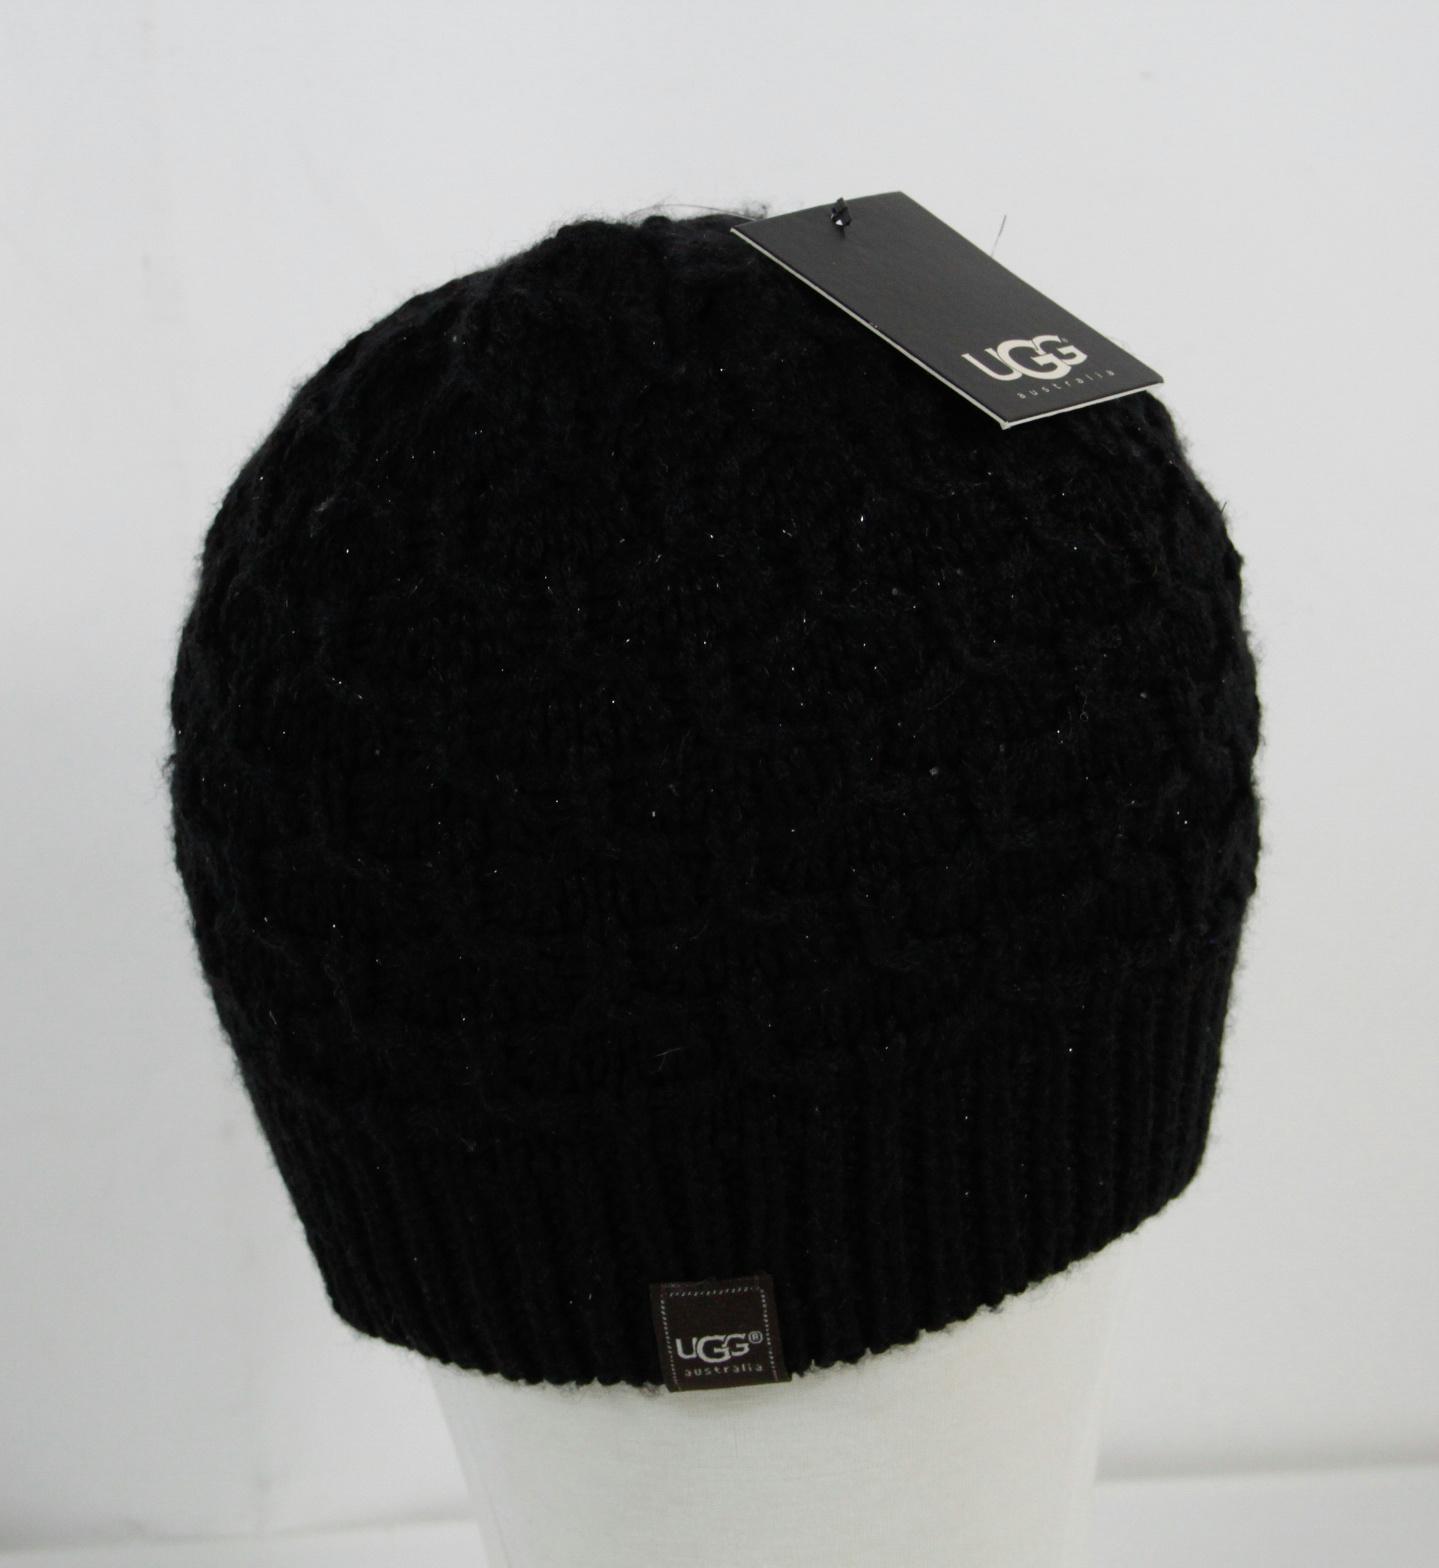 ugg black beanie hat